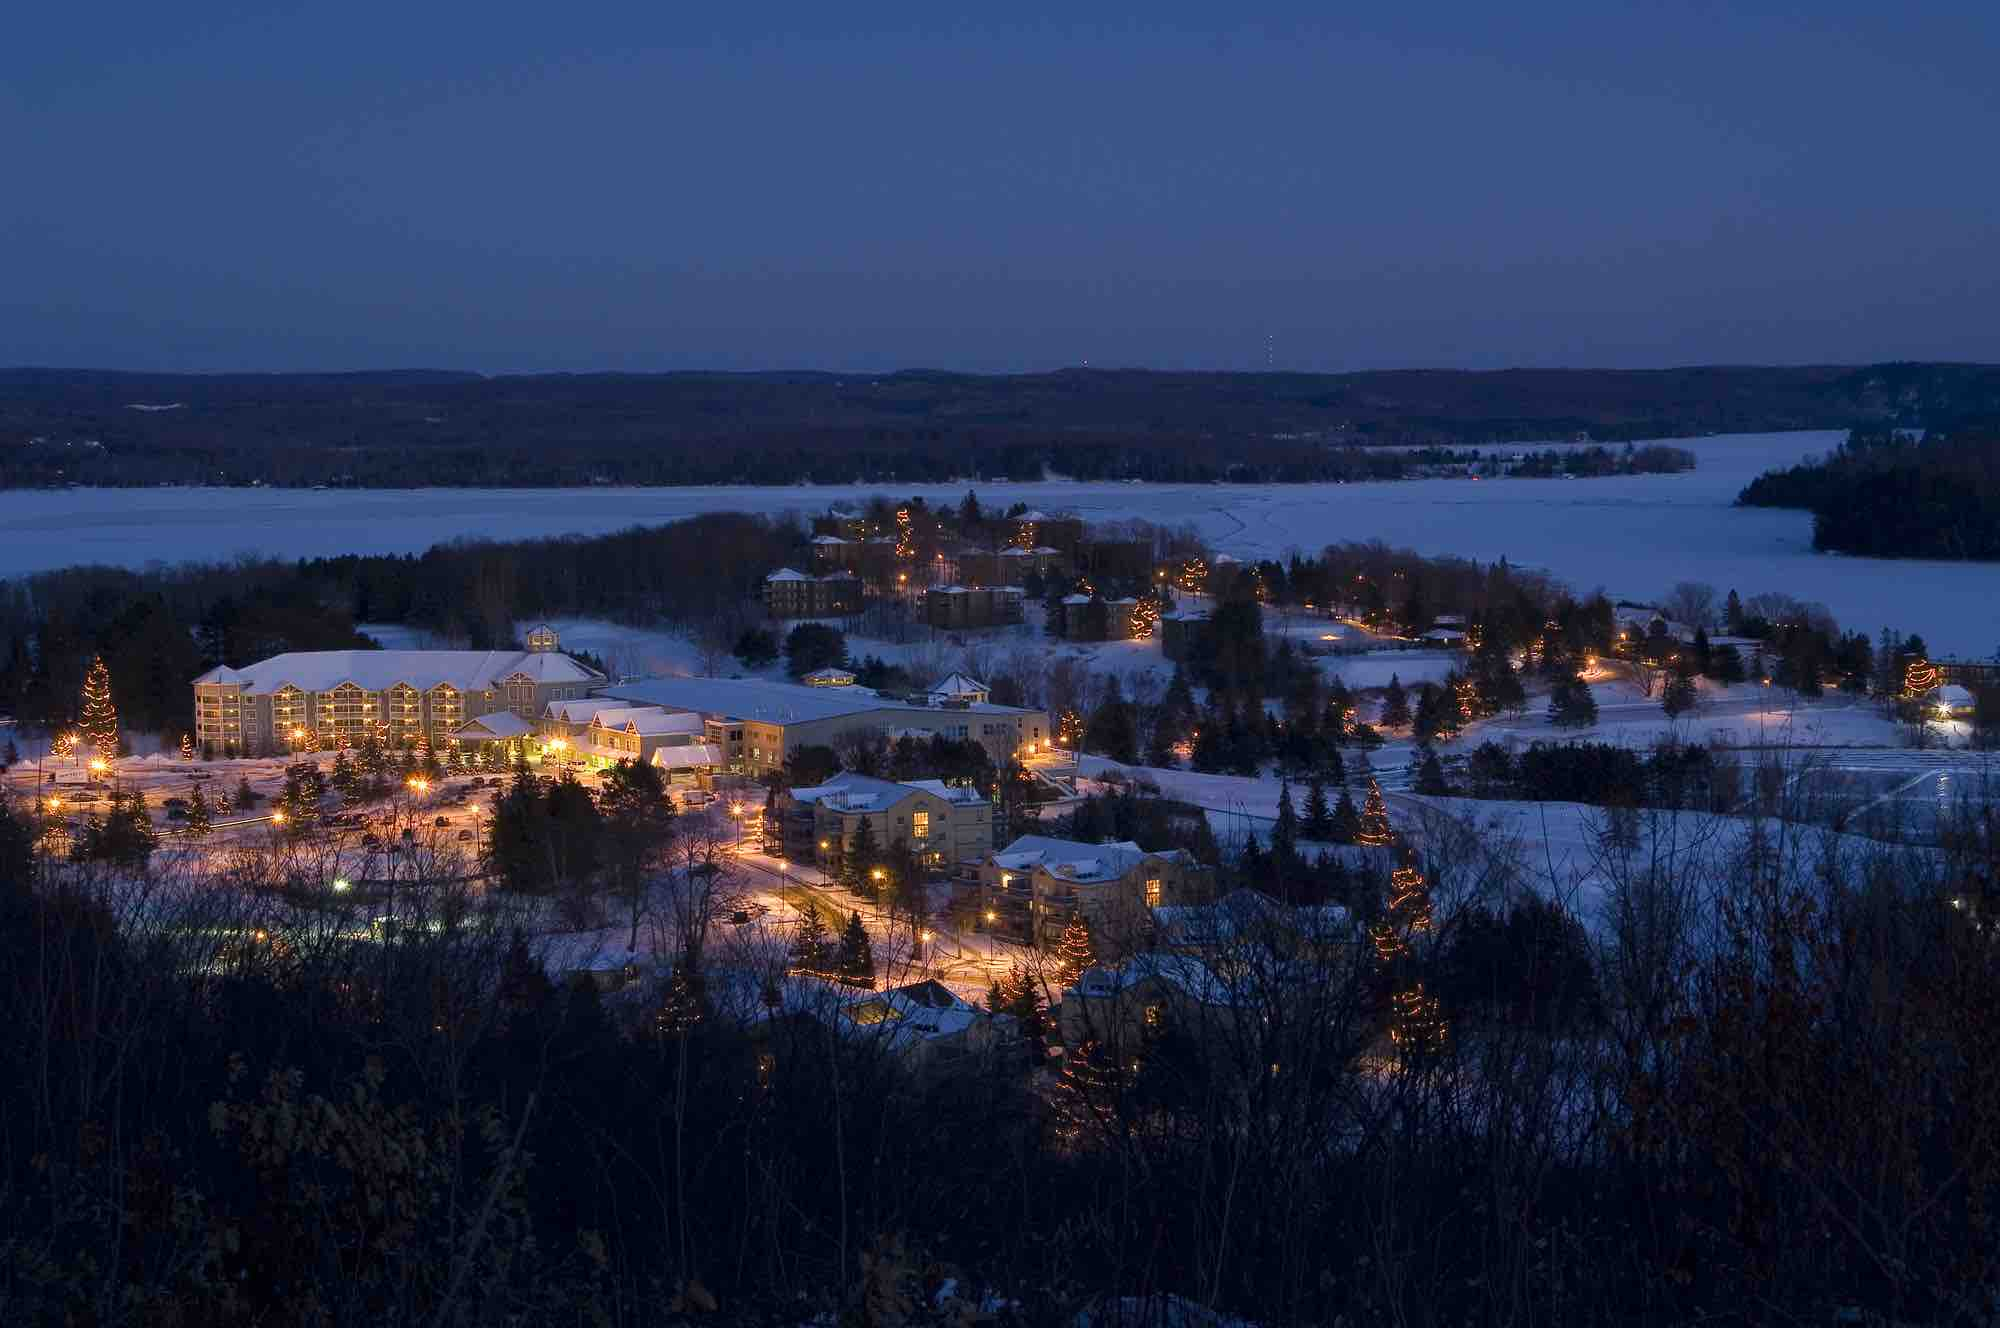 Deerhurst Resort in Huntsville aerial view at night in winter of one of the top luxury muskoka resorts